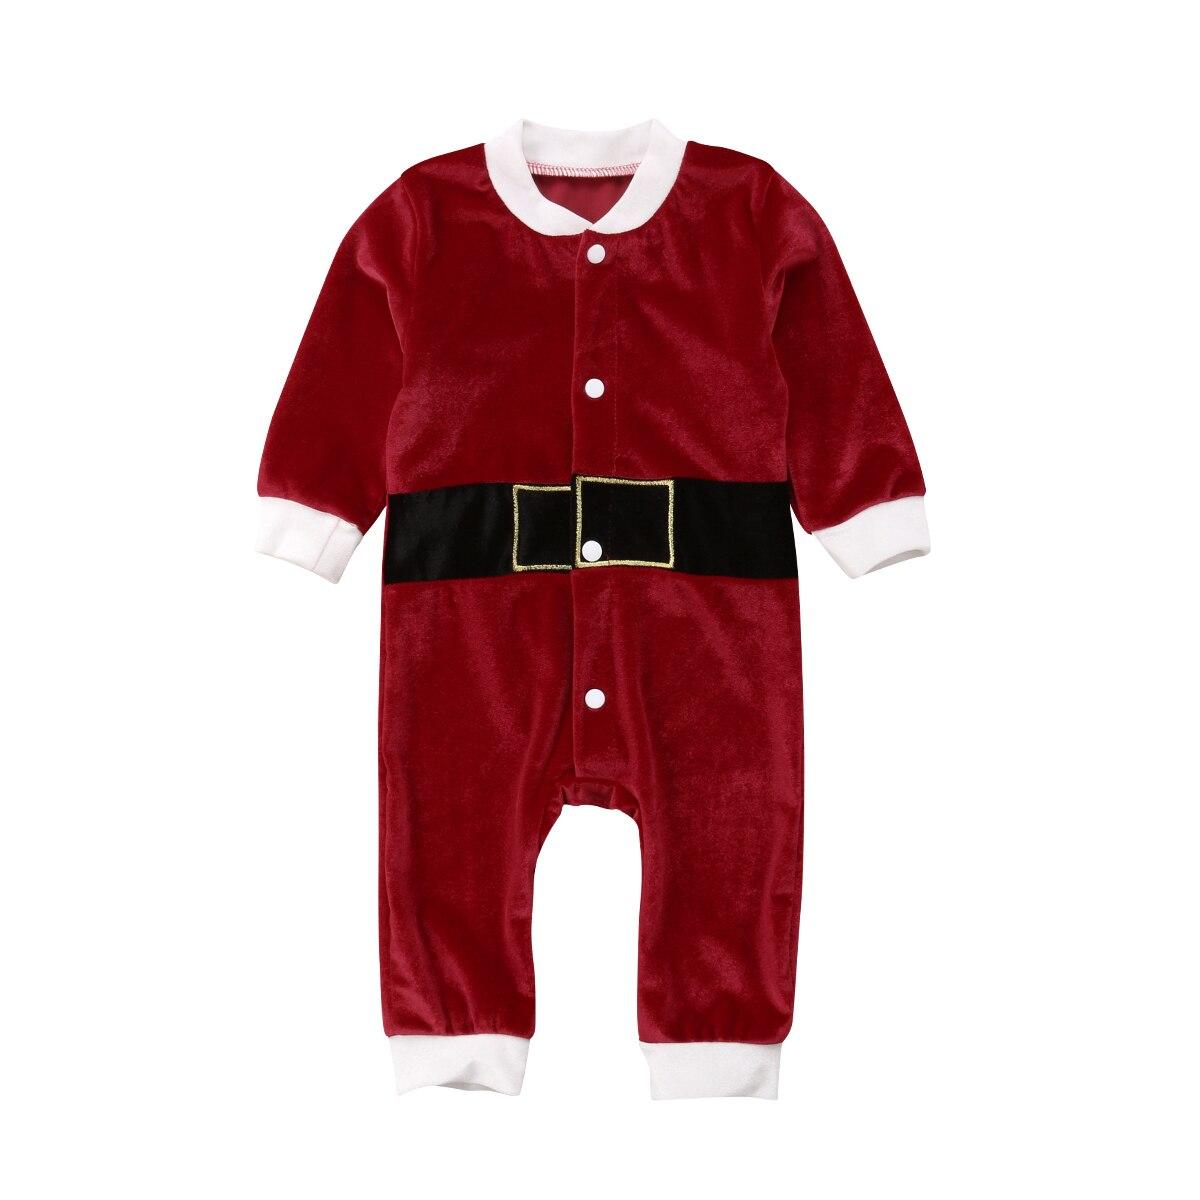 2018 bebé recién nacido niños niñas manga larga Navidad mameluco Unisex Santa traje pijamas ropa otoño Navidad trajes